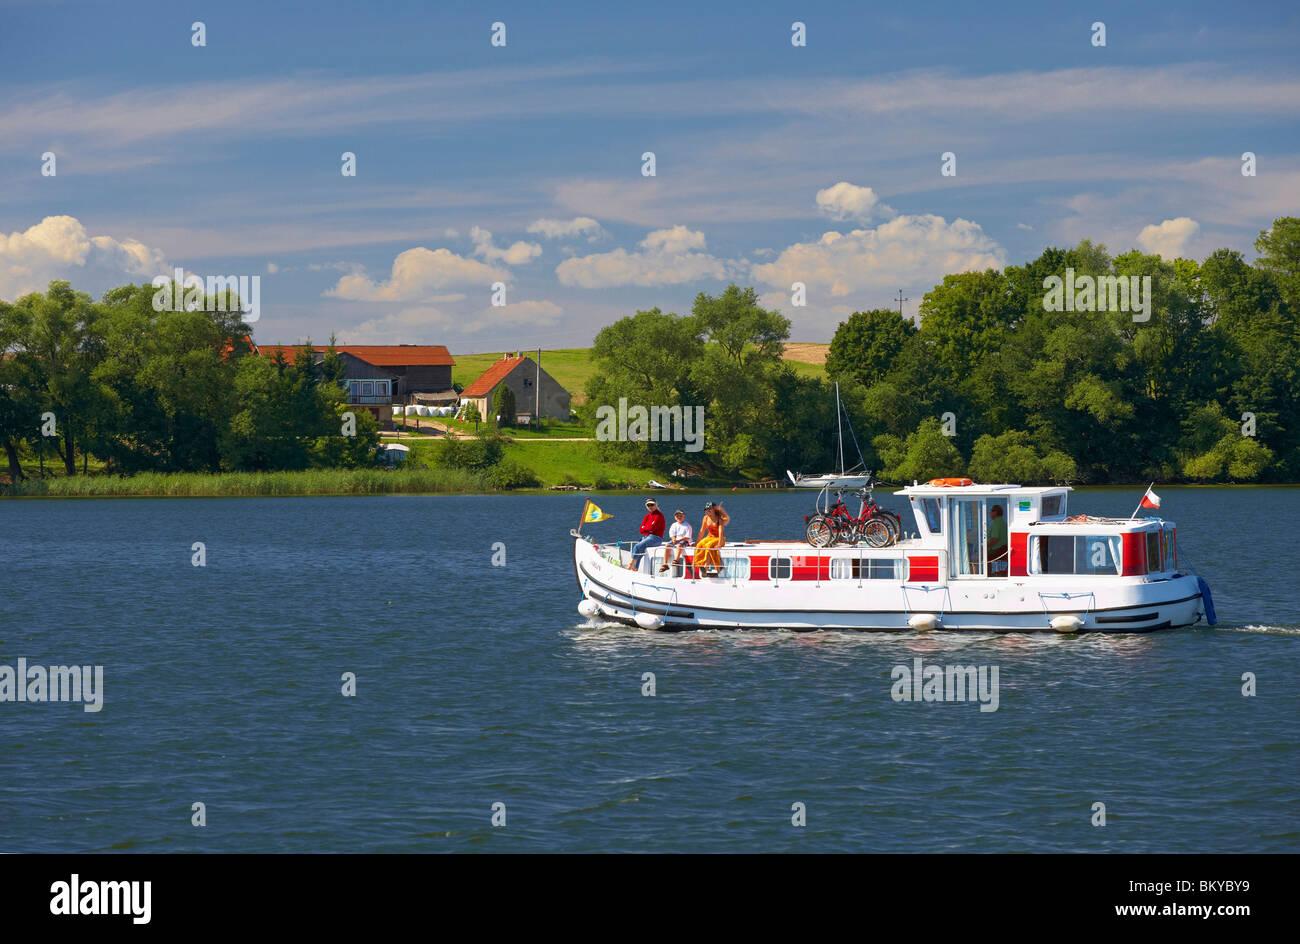 Houseboat on Jezioro Talty (Talter-Gewaesser), Mazurskie Pojezierze, East Prussia, Poland, Europe - Stock Image